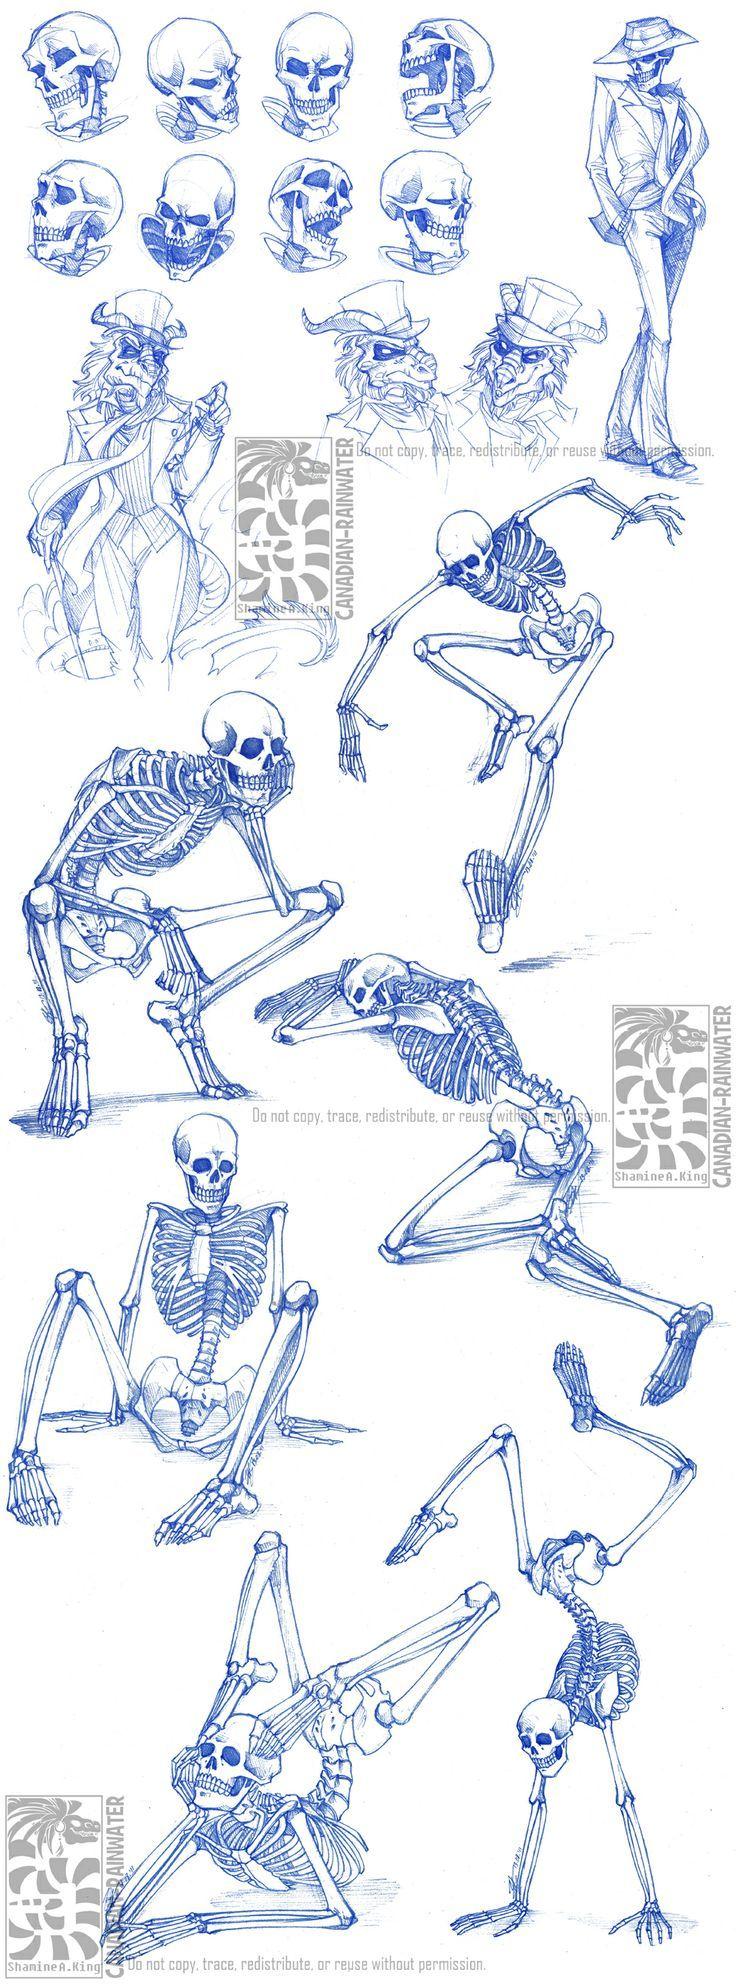 Skeletal Sketchdump by Canadian-Rainwater on deviantART via PinCG.com